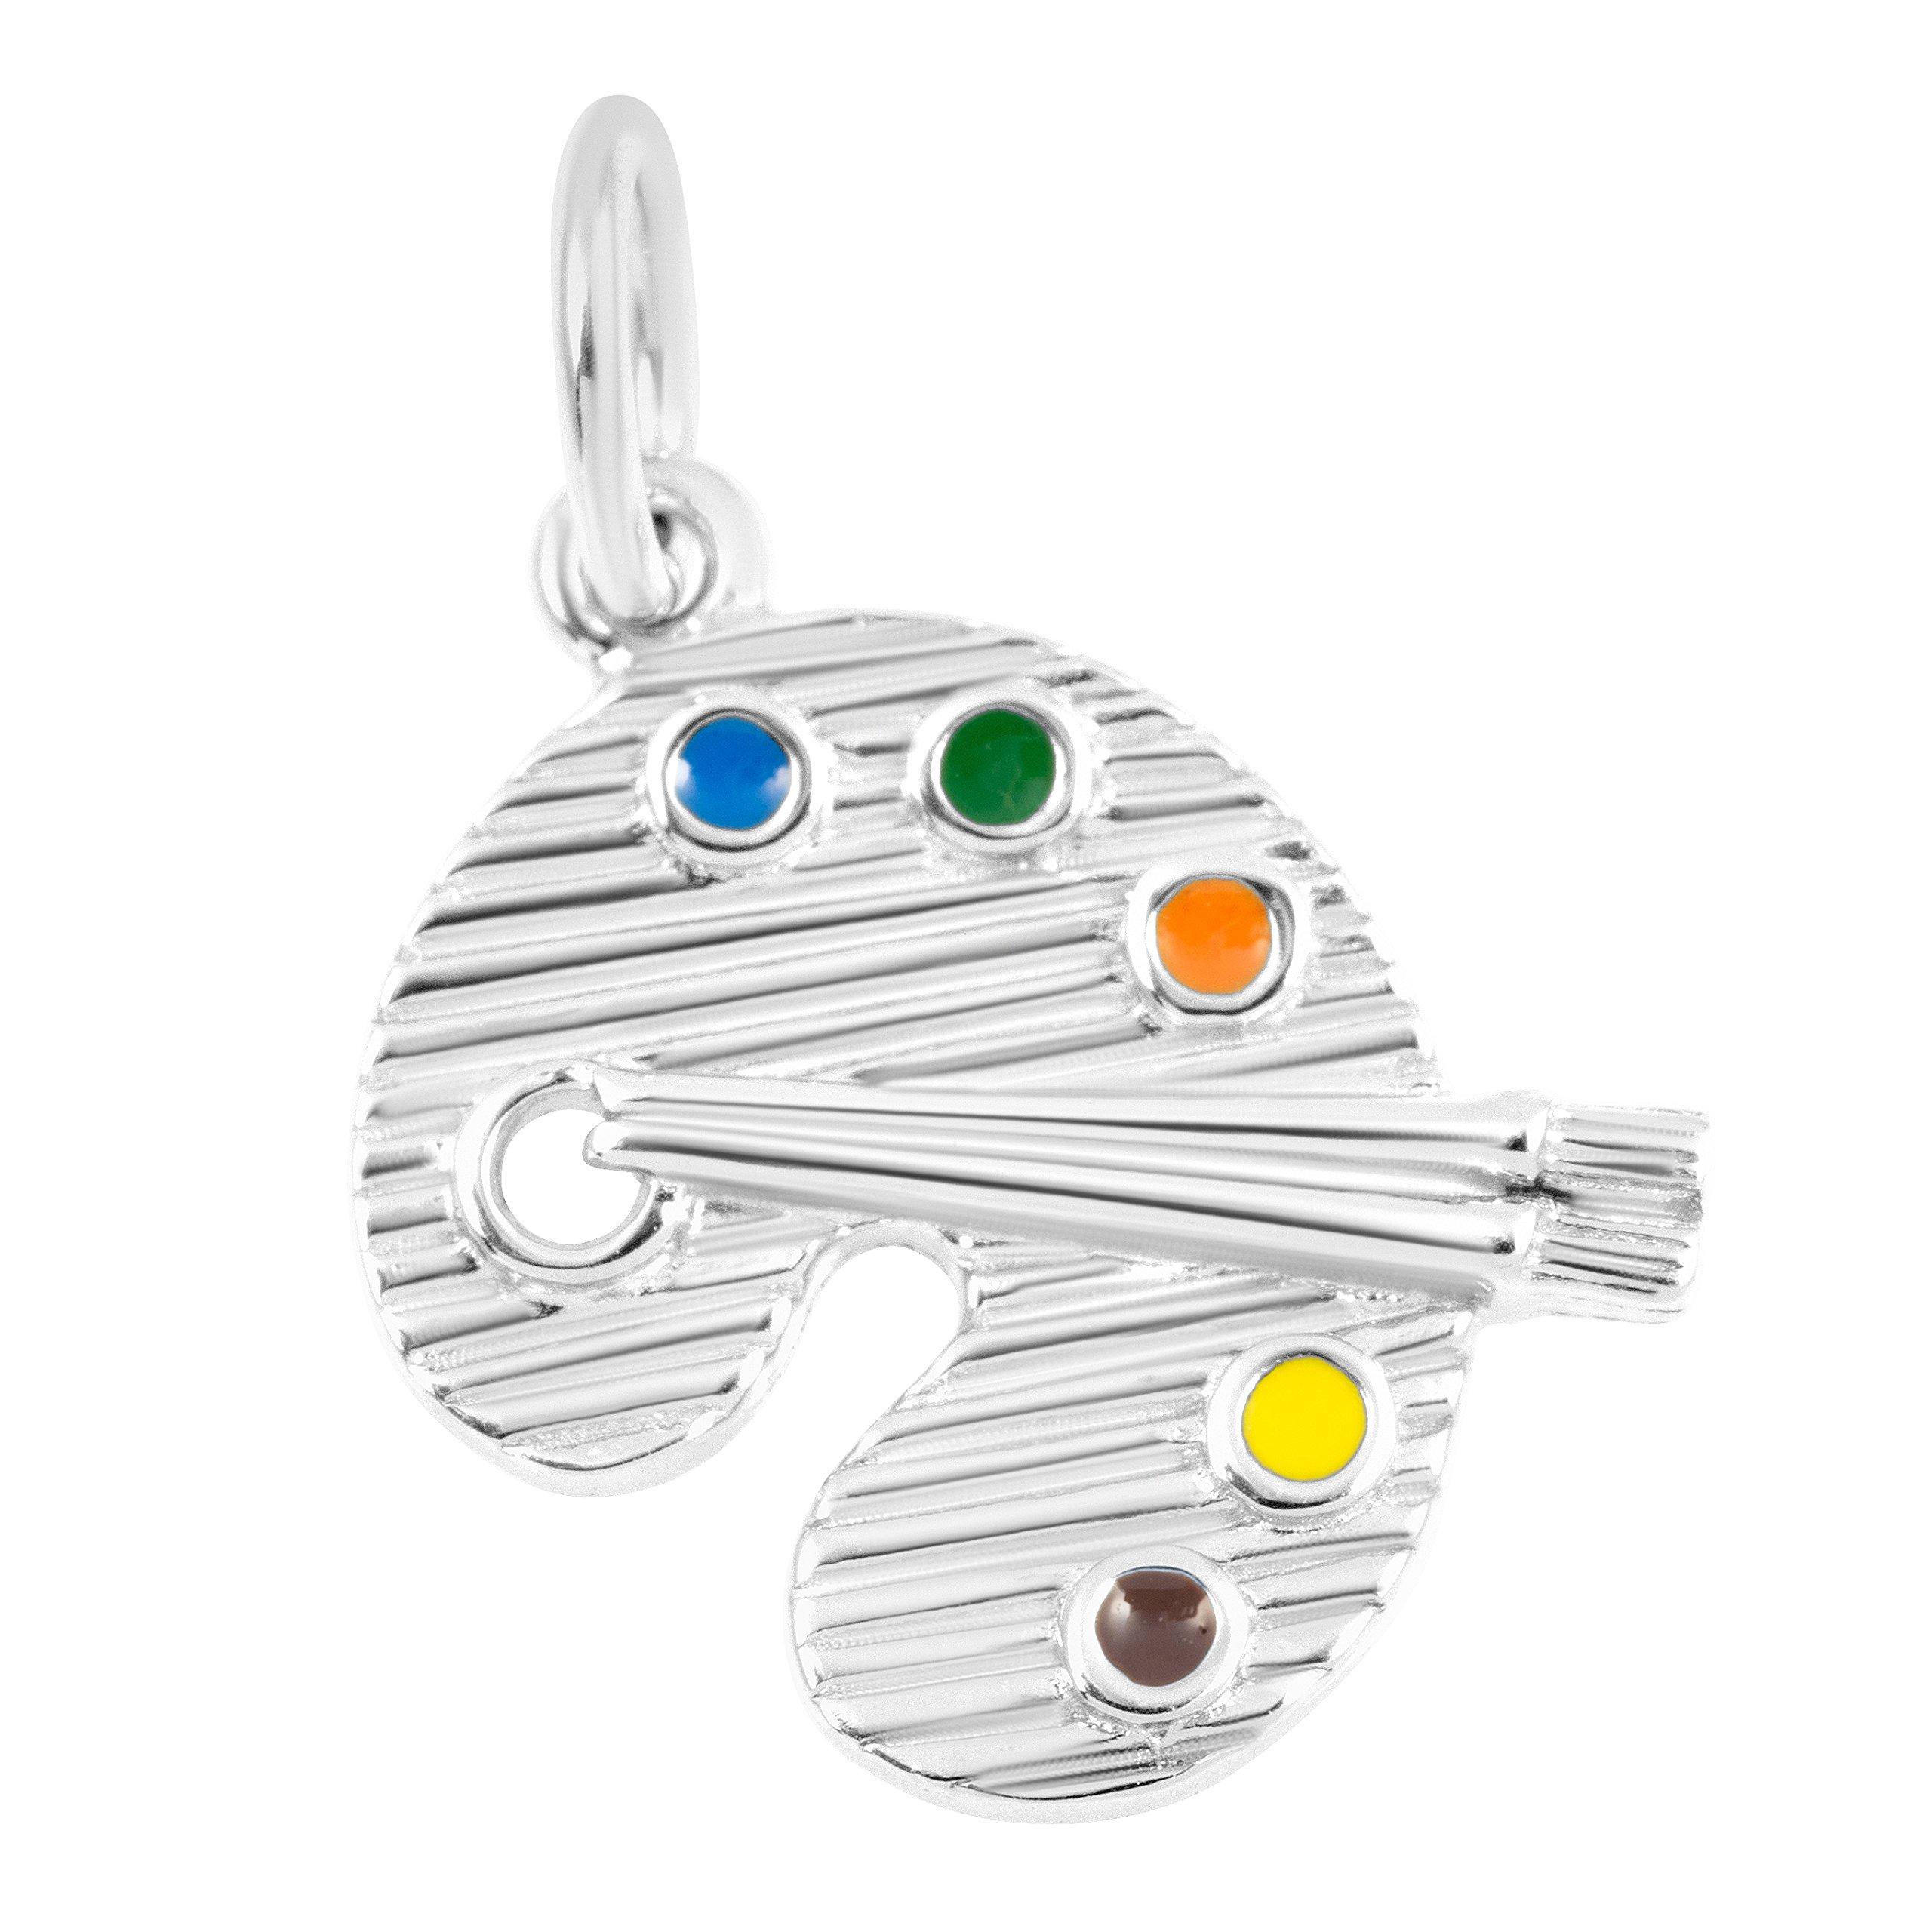 Necklace & Bracelet Charms – Graduate & Profession Theme Fine Jewelry by Silver on the Rocks